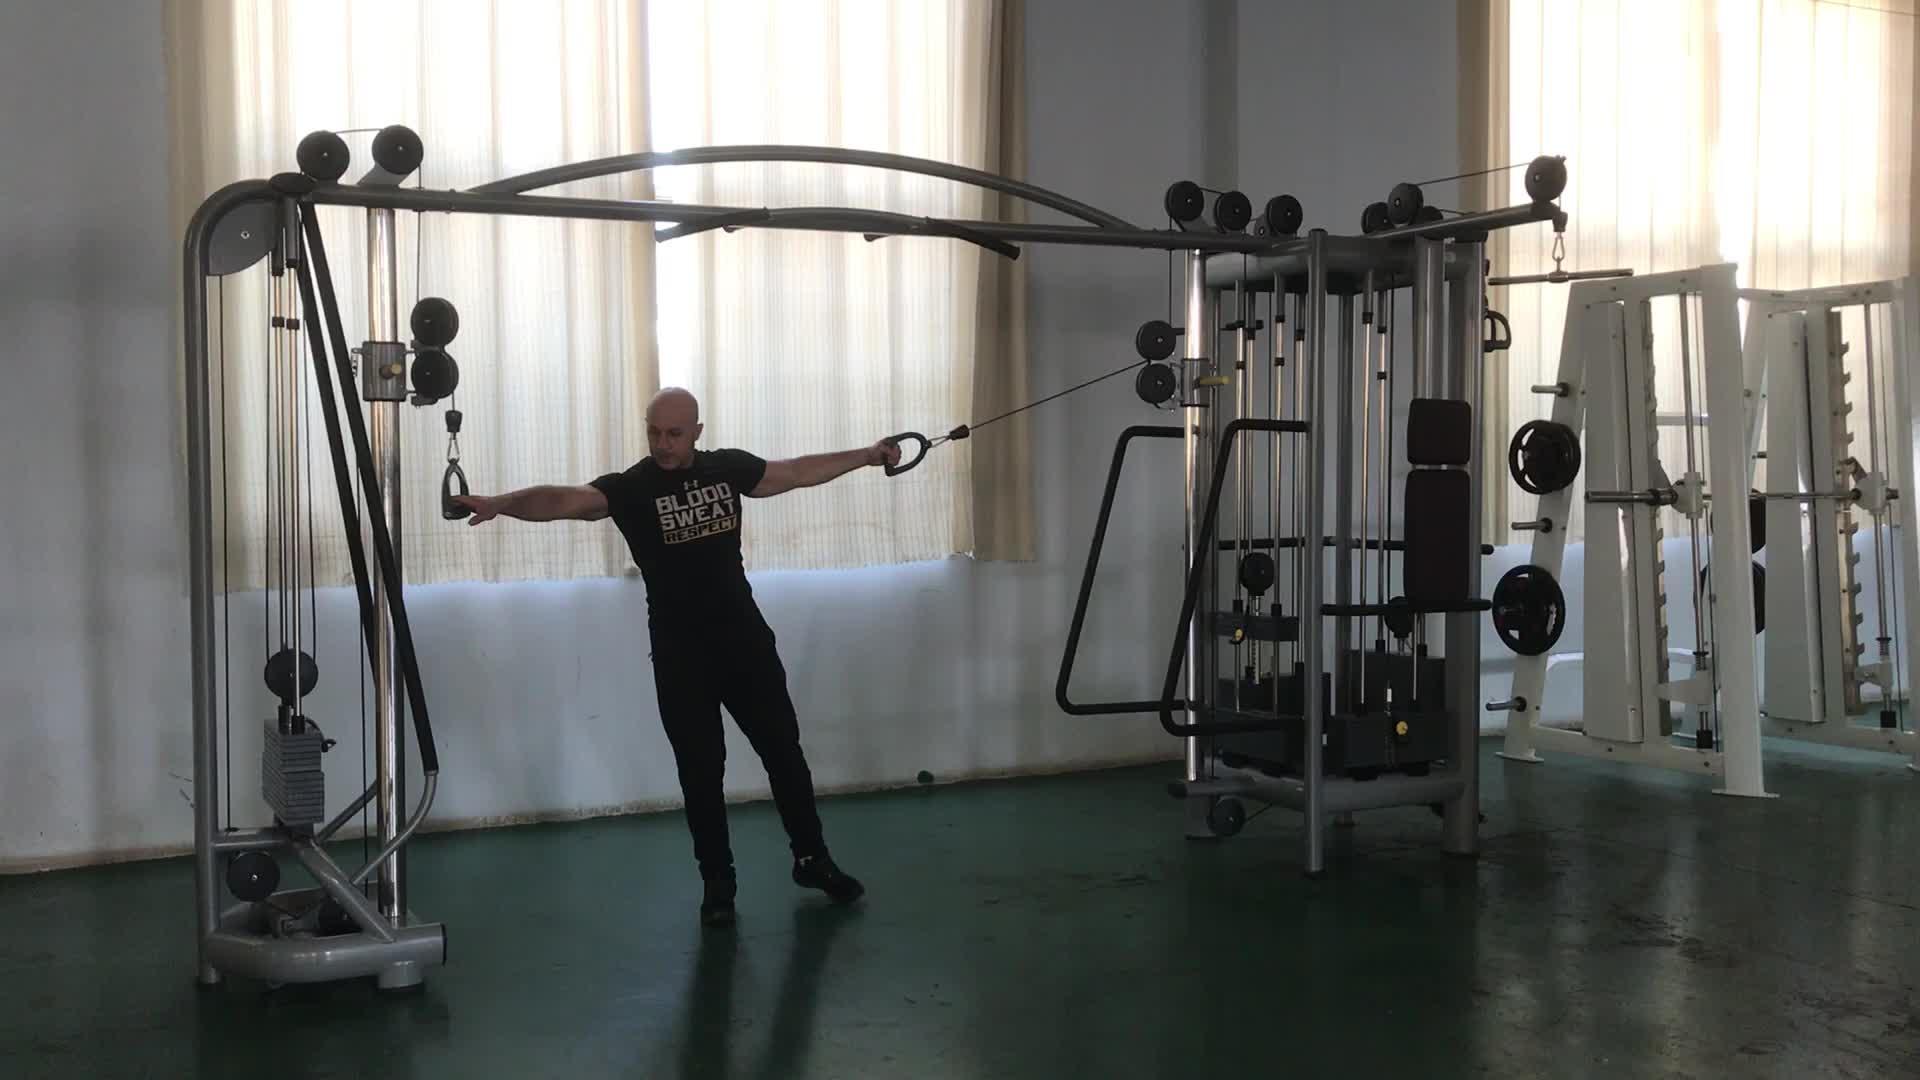 multi-function smith machine / home fitness equipment